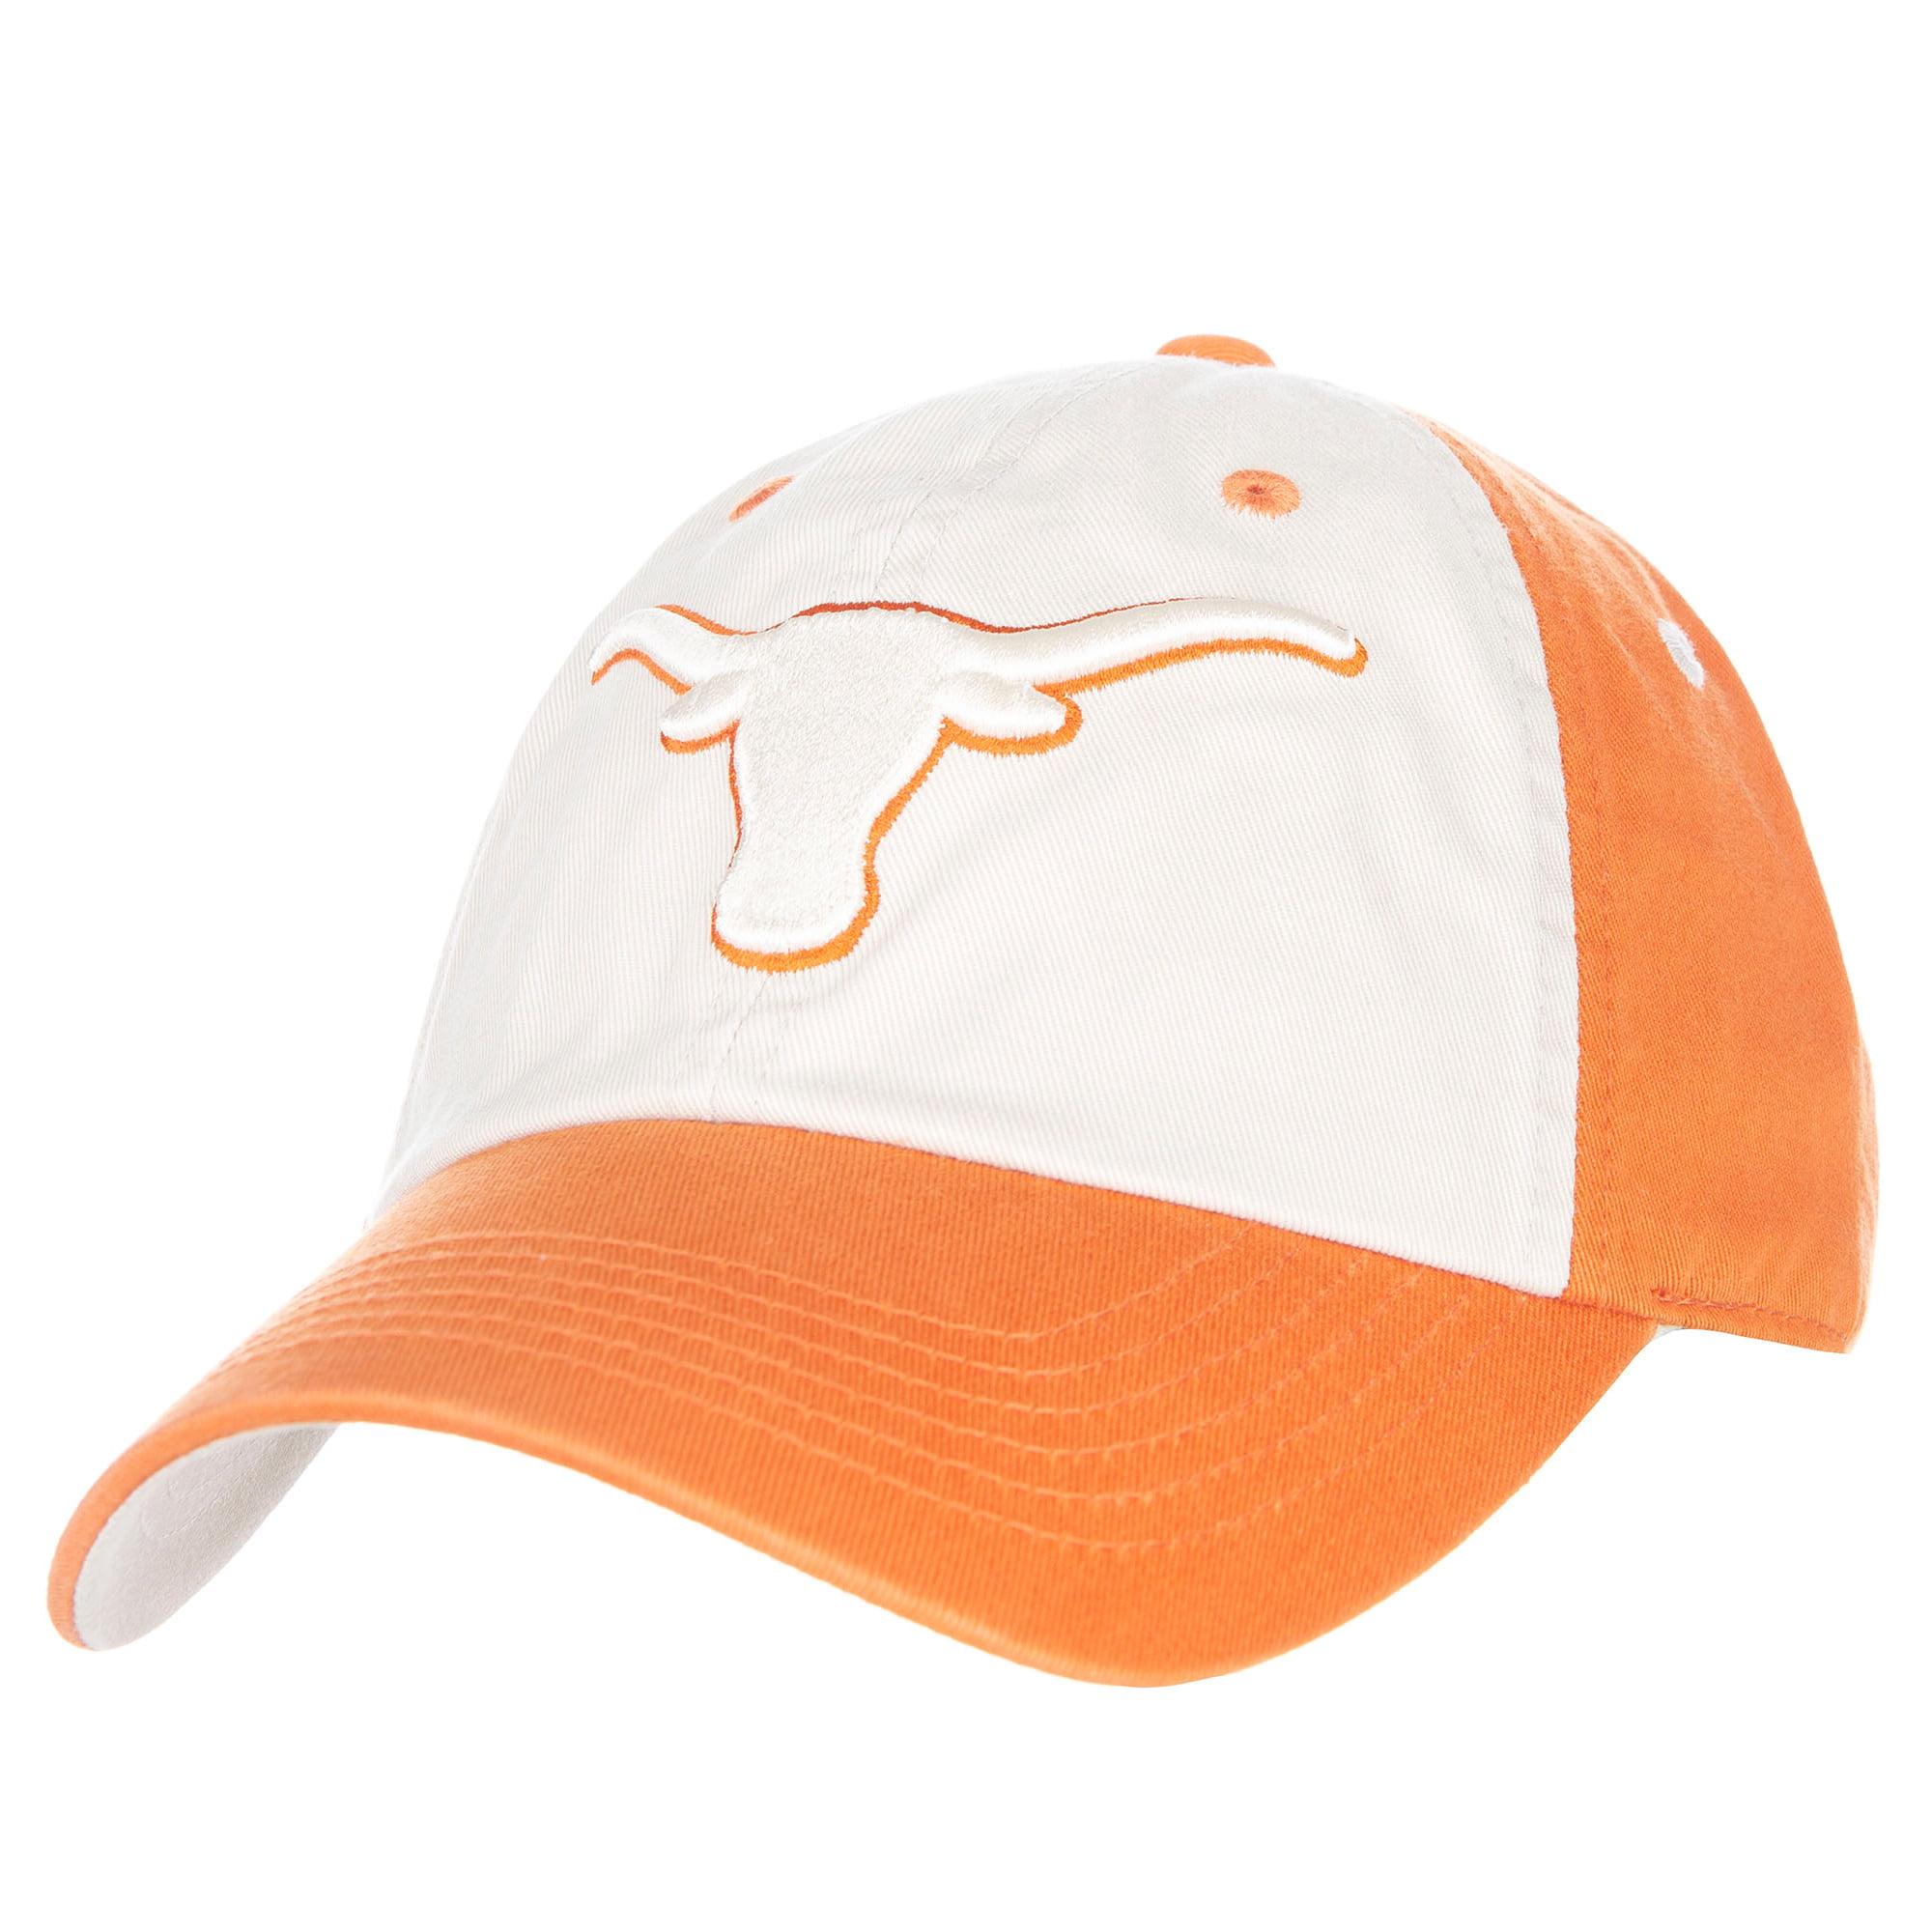 Men's Tan/Texas Orange Texas Longhorns Goulburn Adjustable Hat - OSFA